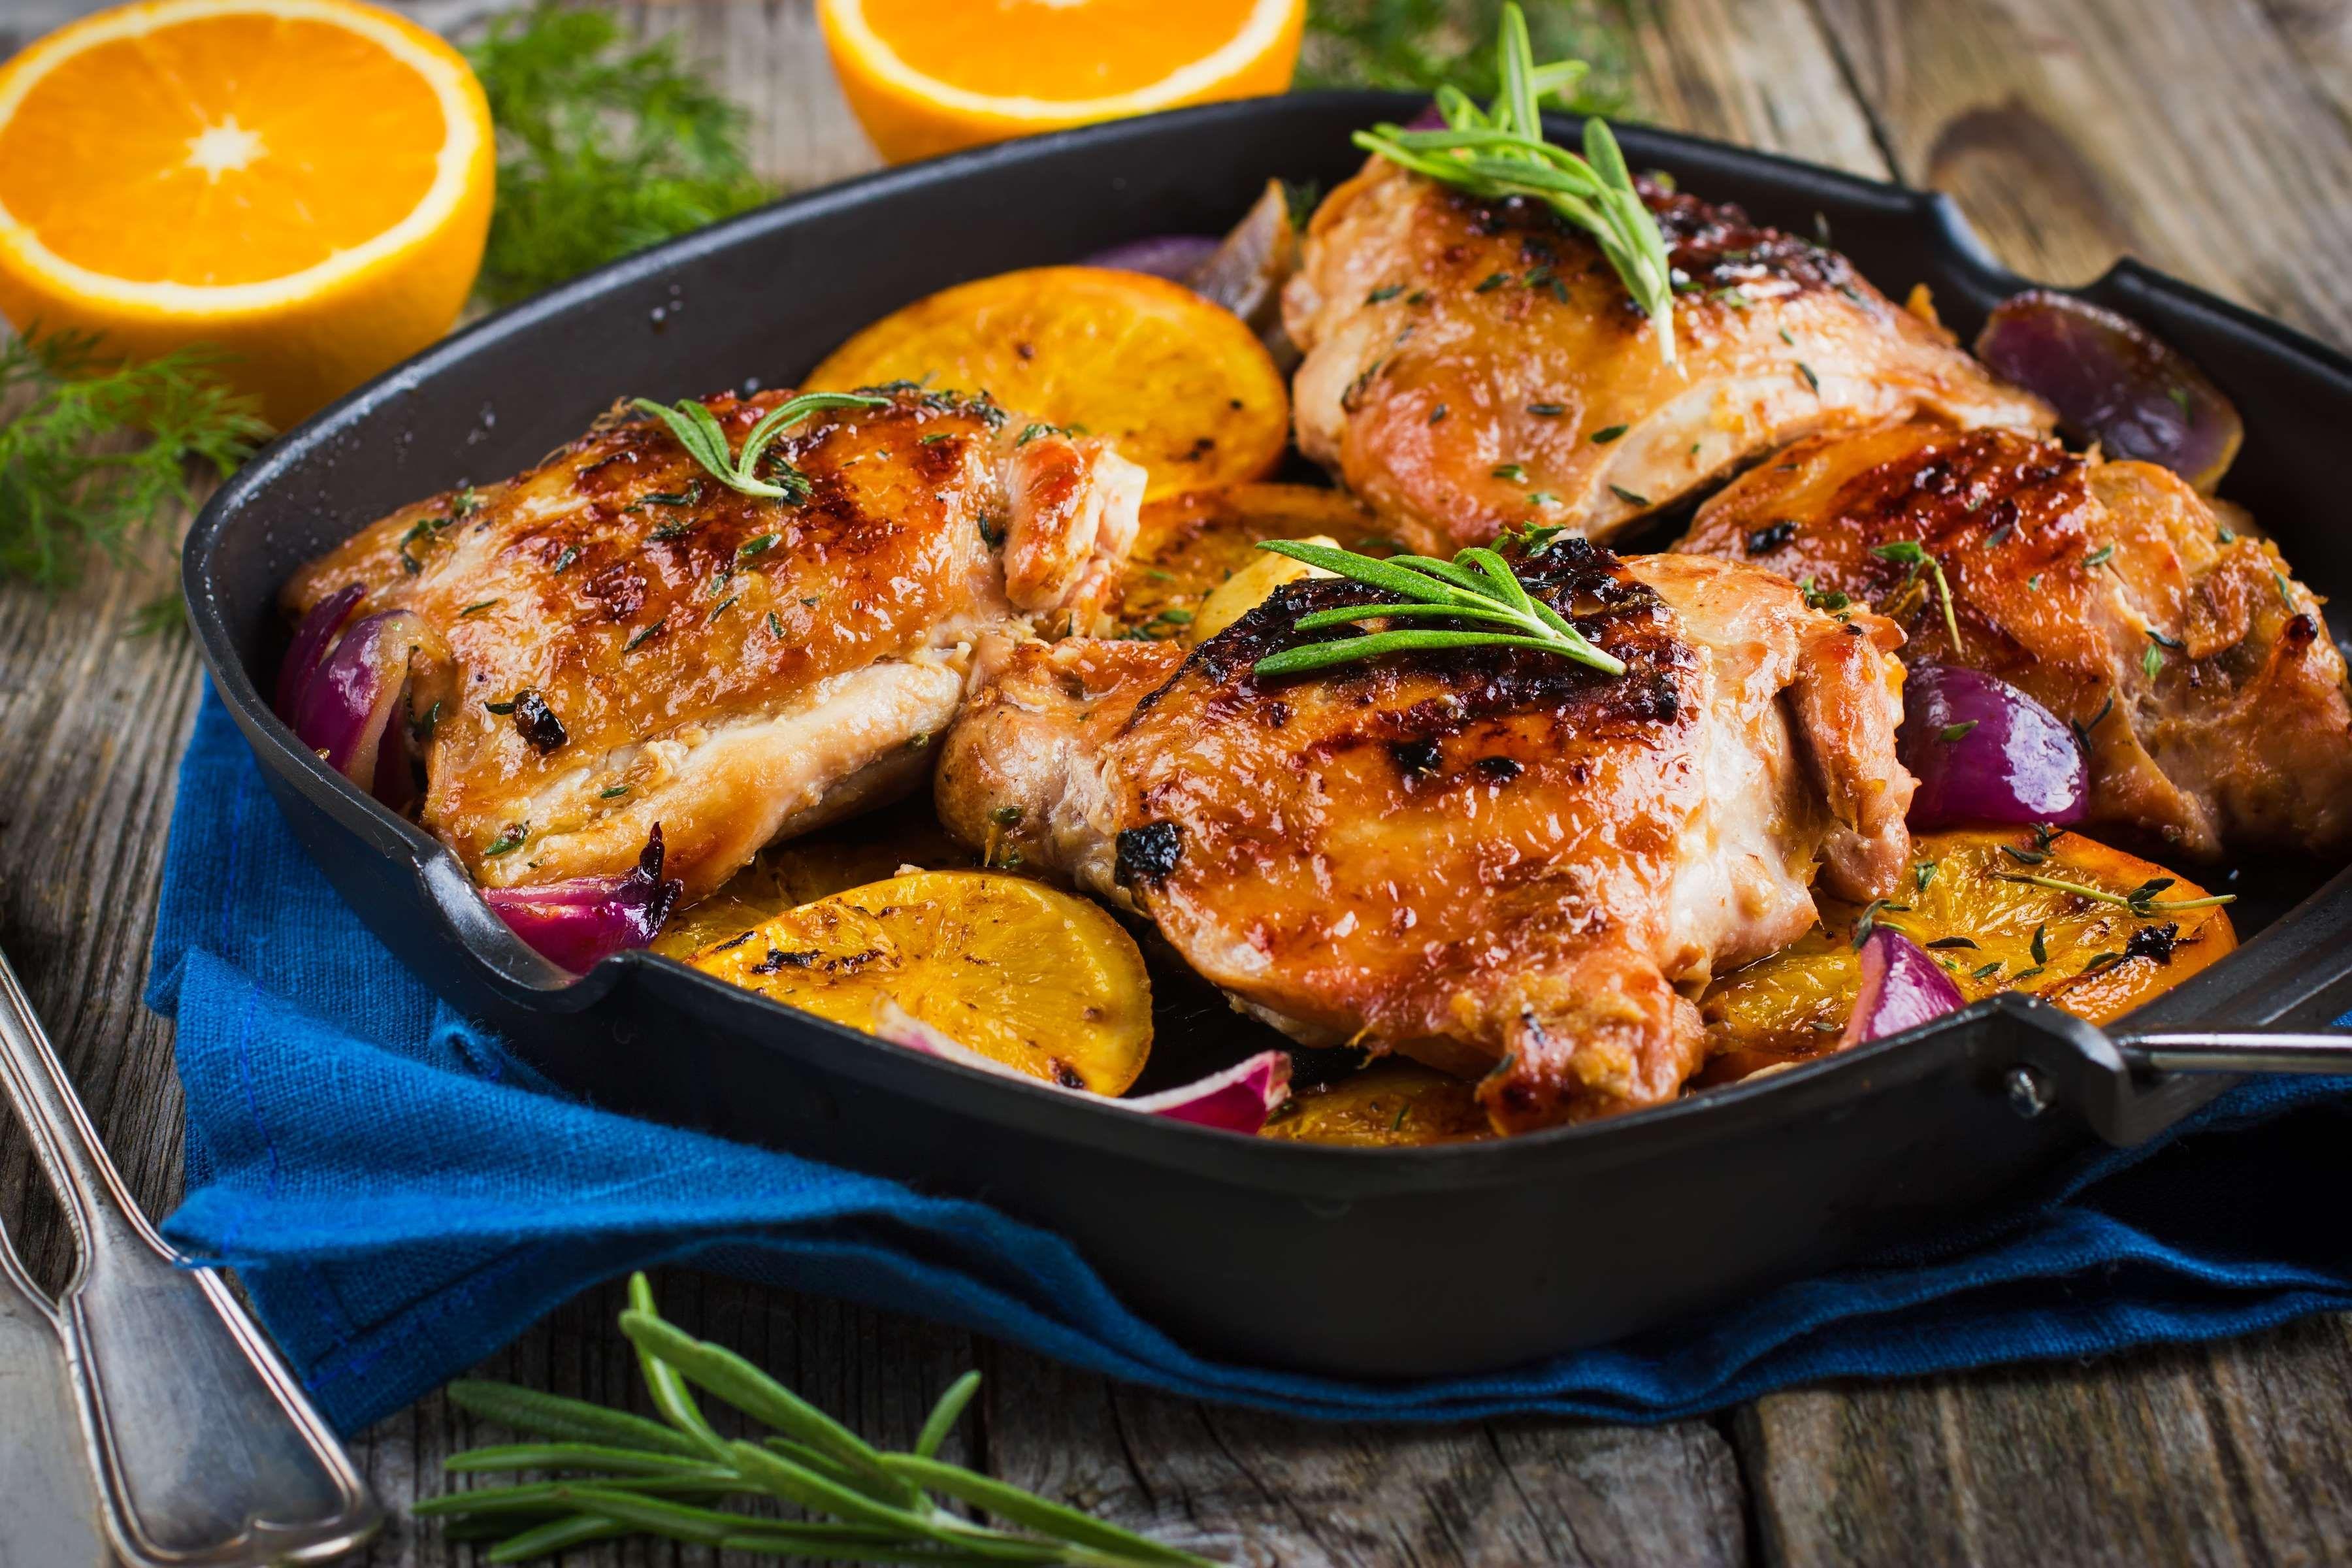 Chefbear Roast Provencal Chicken Recipe Seafood Cooking Recipes Chicken Recipes Actifry Recipes